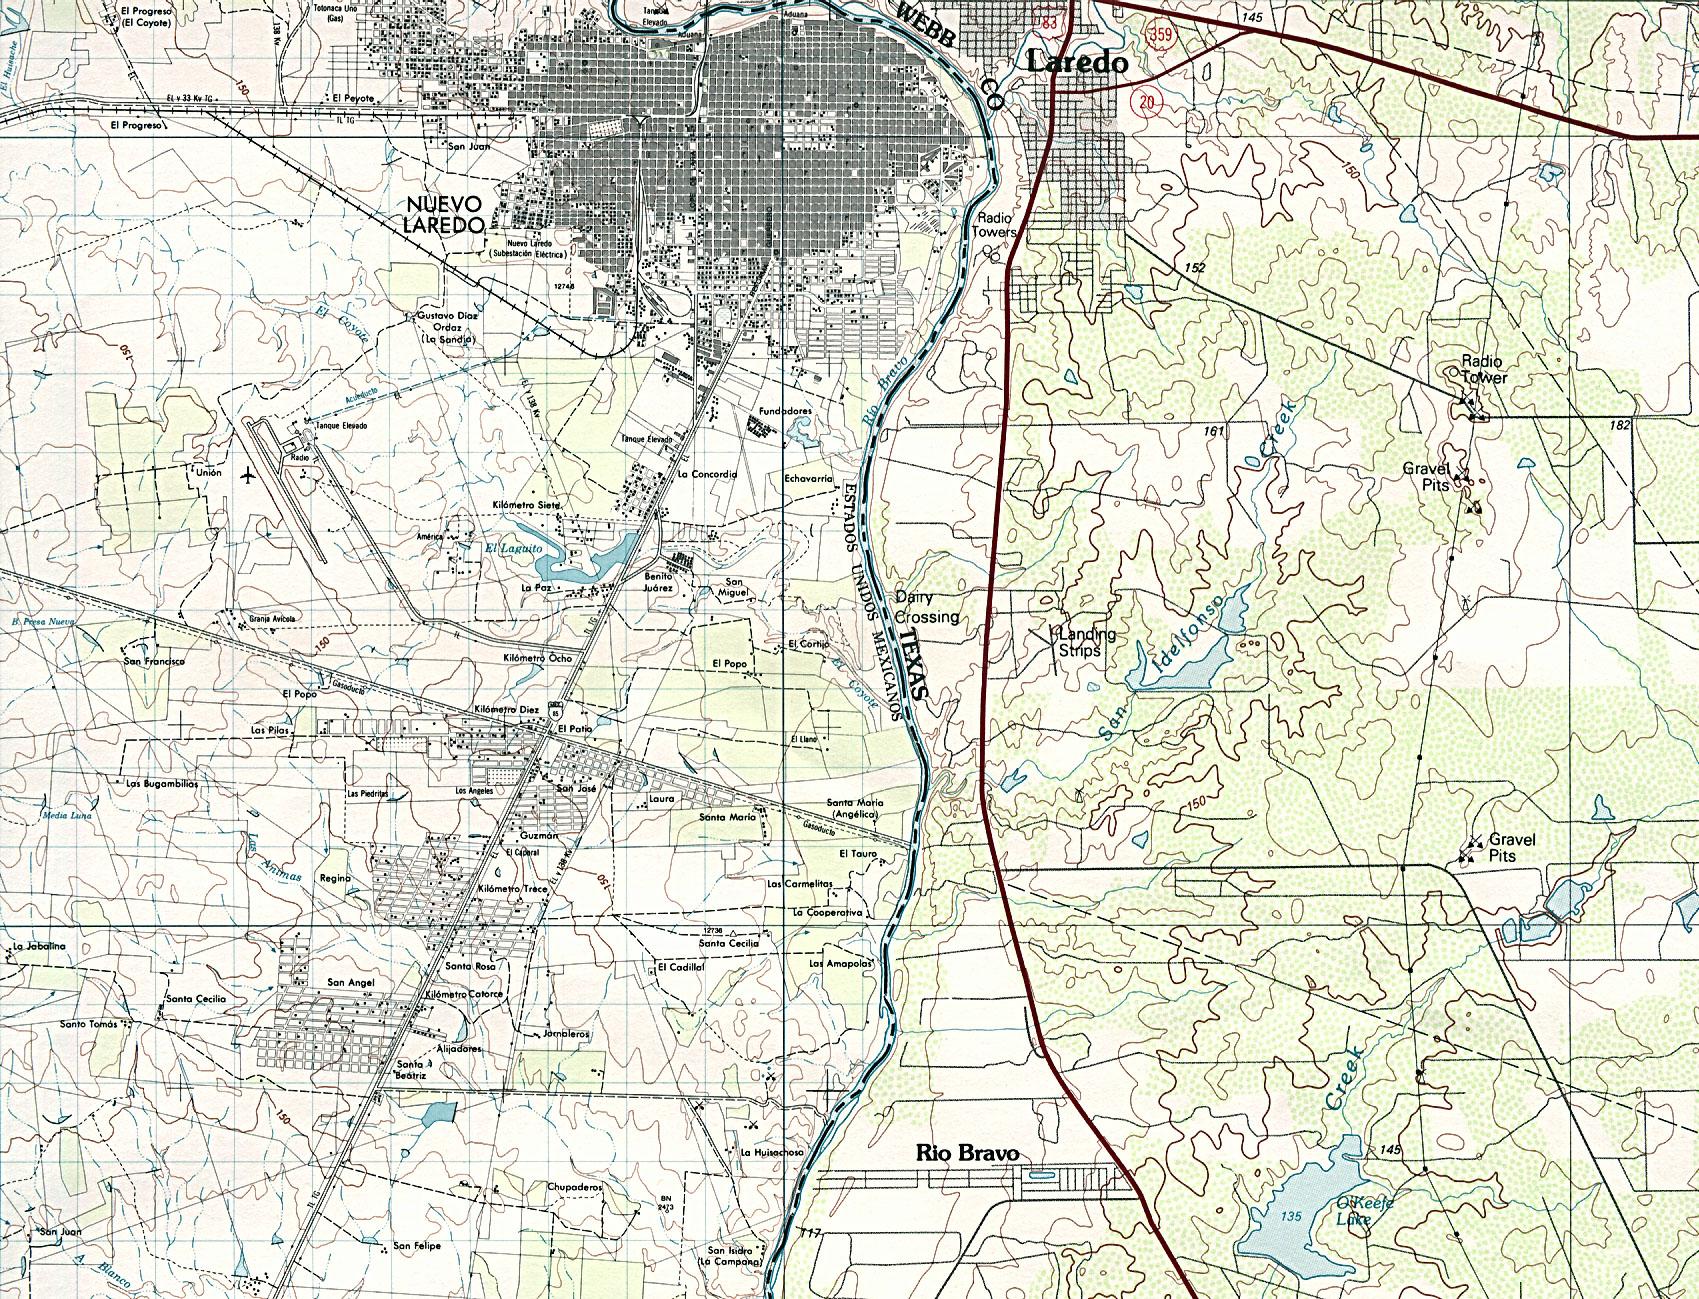 Nuevo Laredo City Map, Mexico